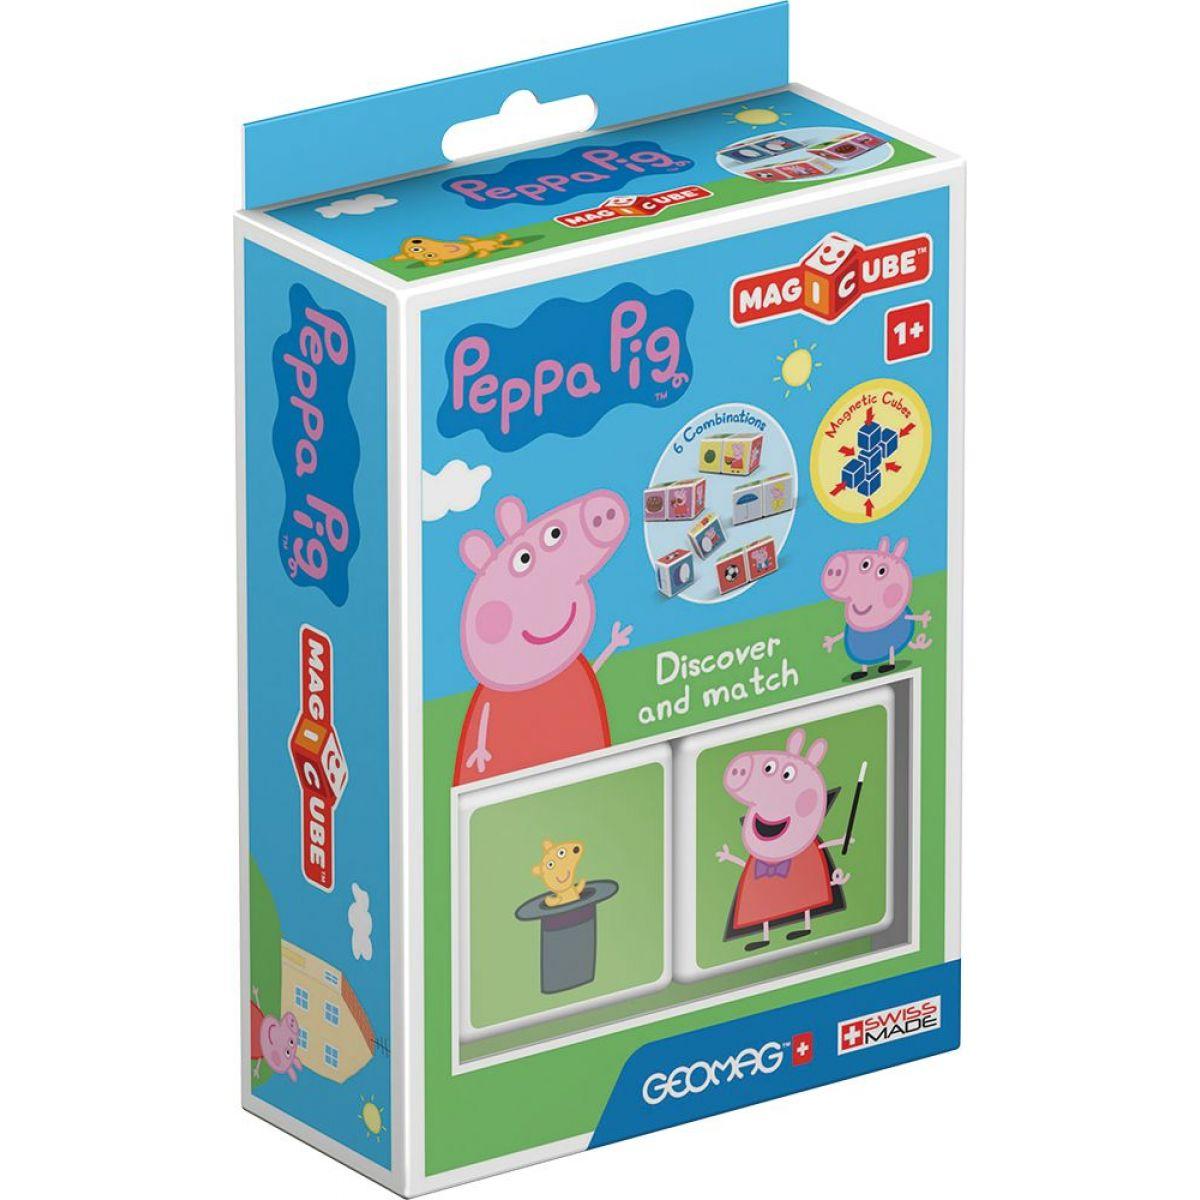 Geomag Magicube Peppa Pig Discover & Match